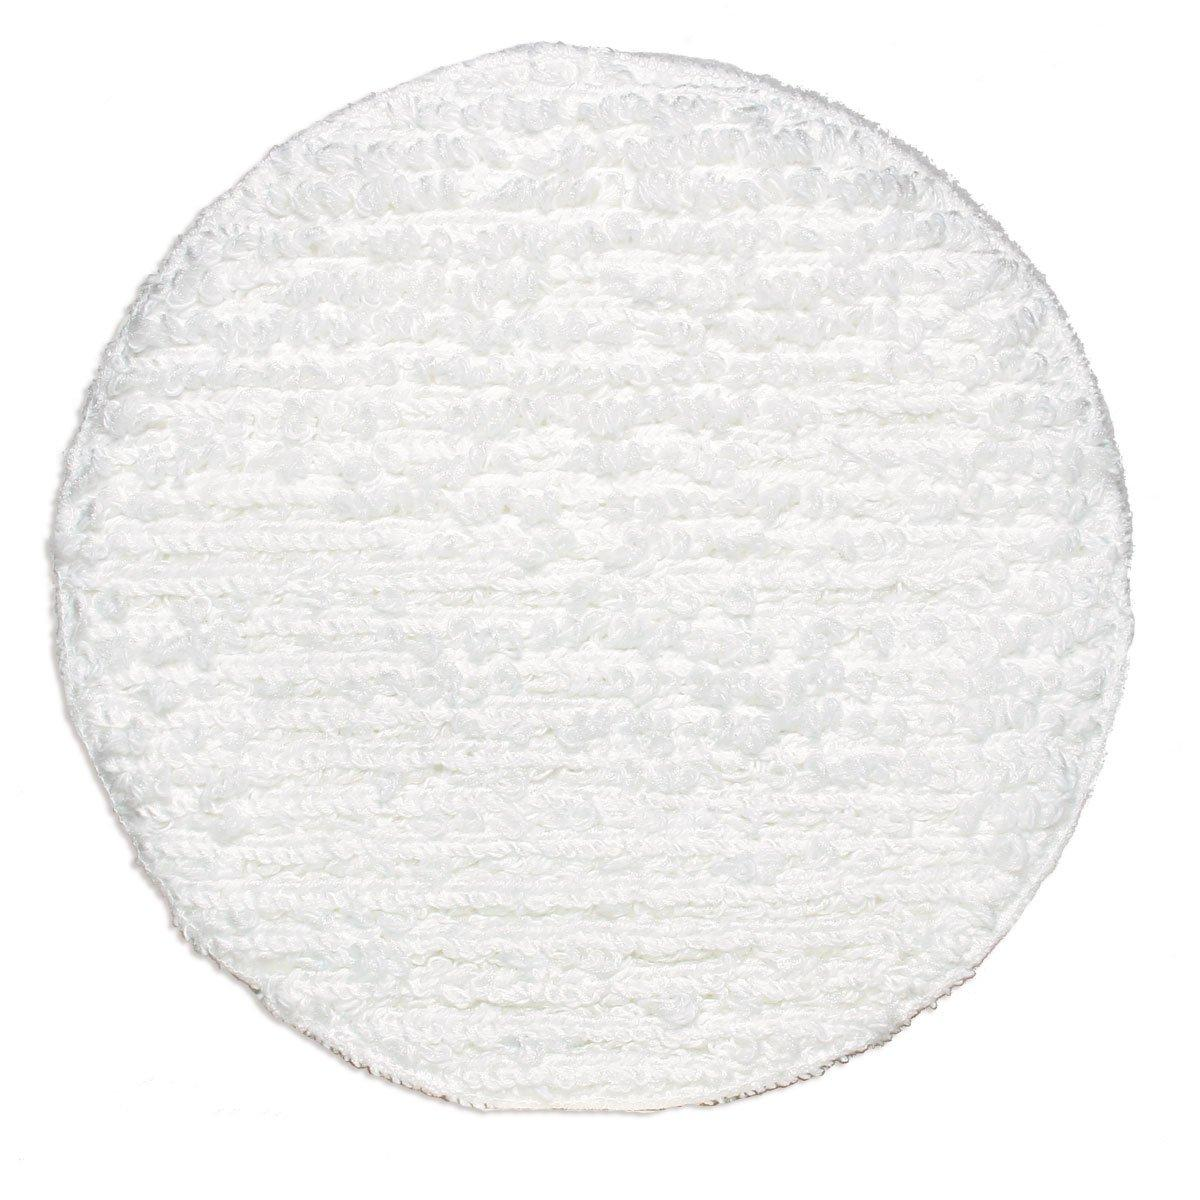 Orbiter White Terry Cloth Bonnet1